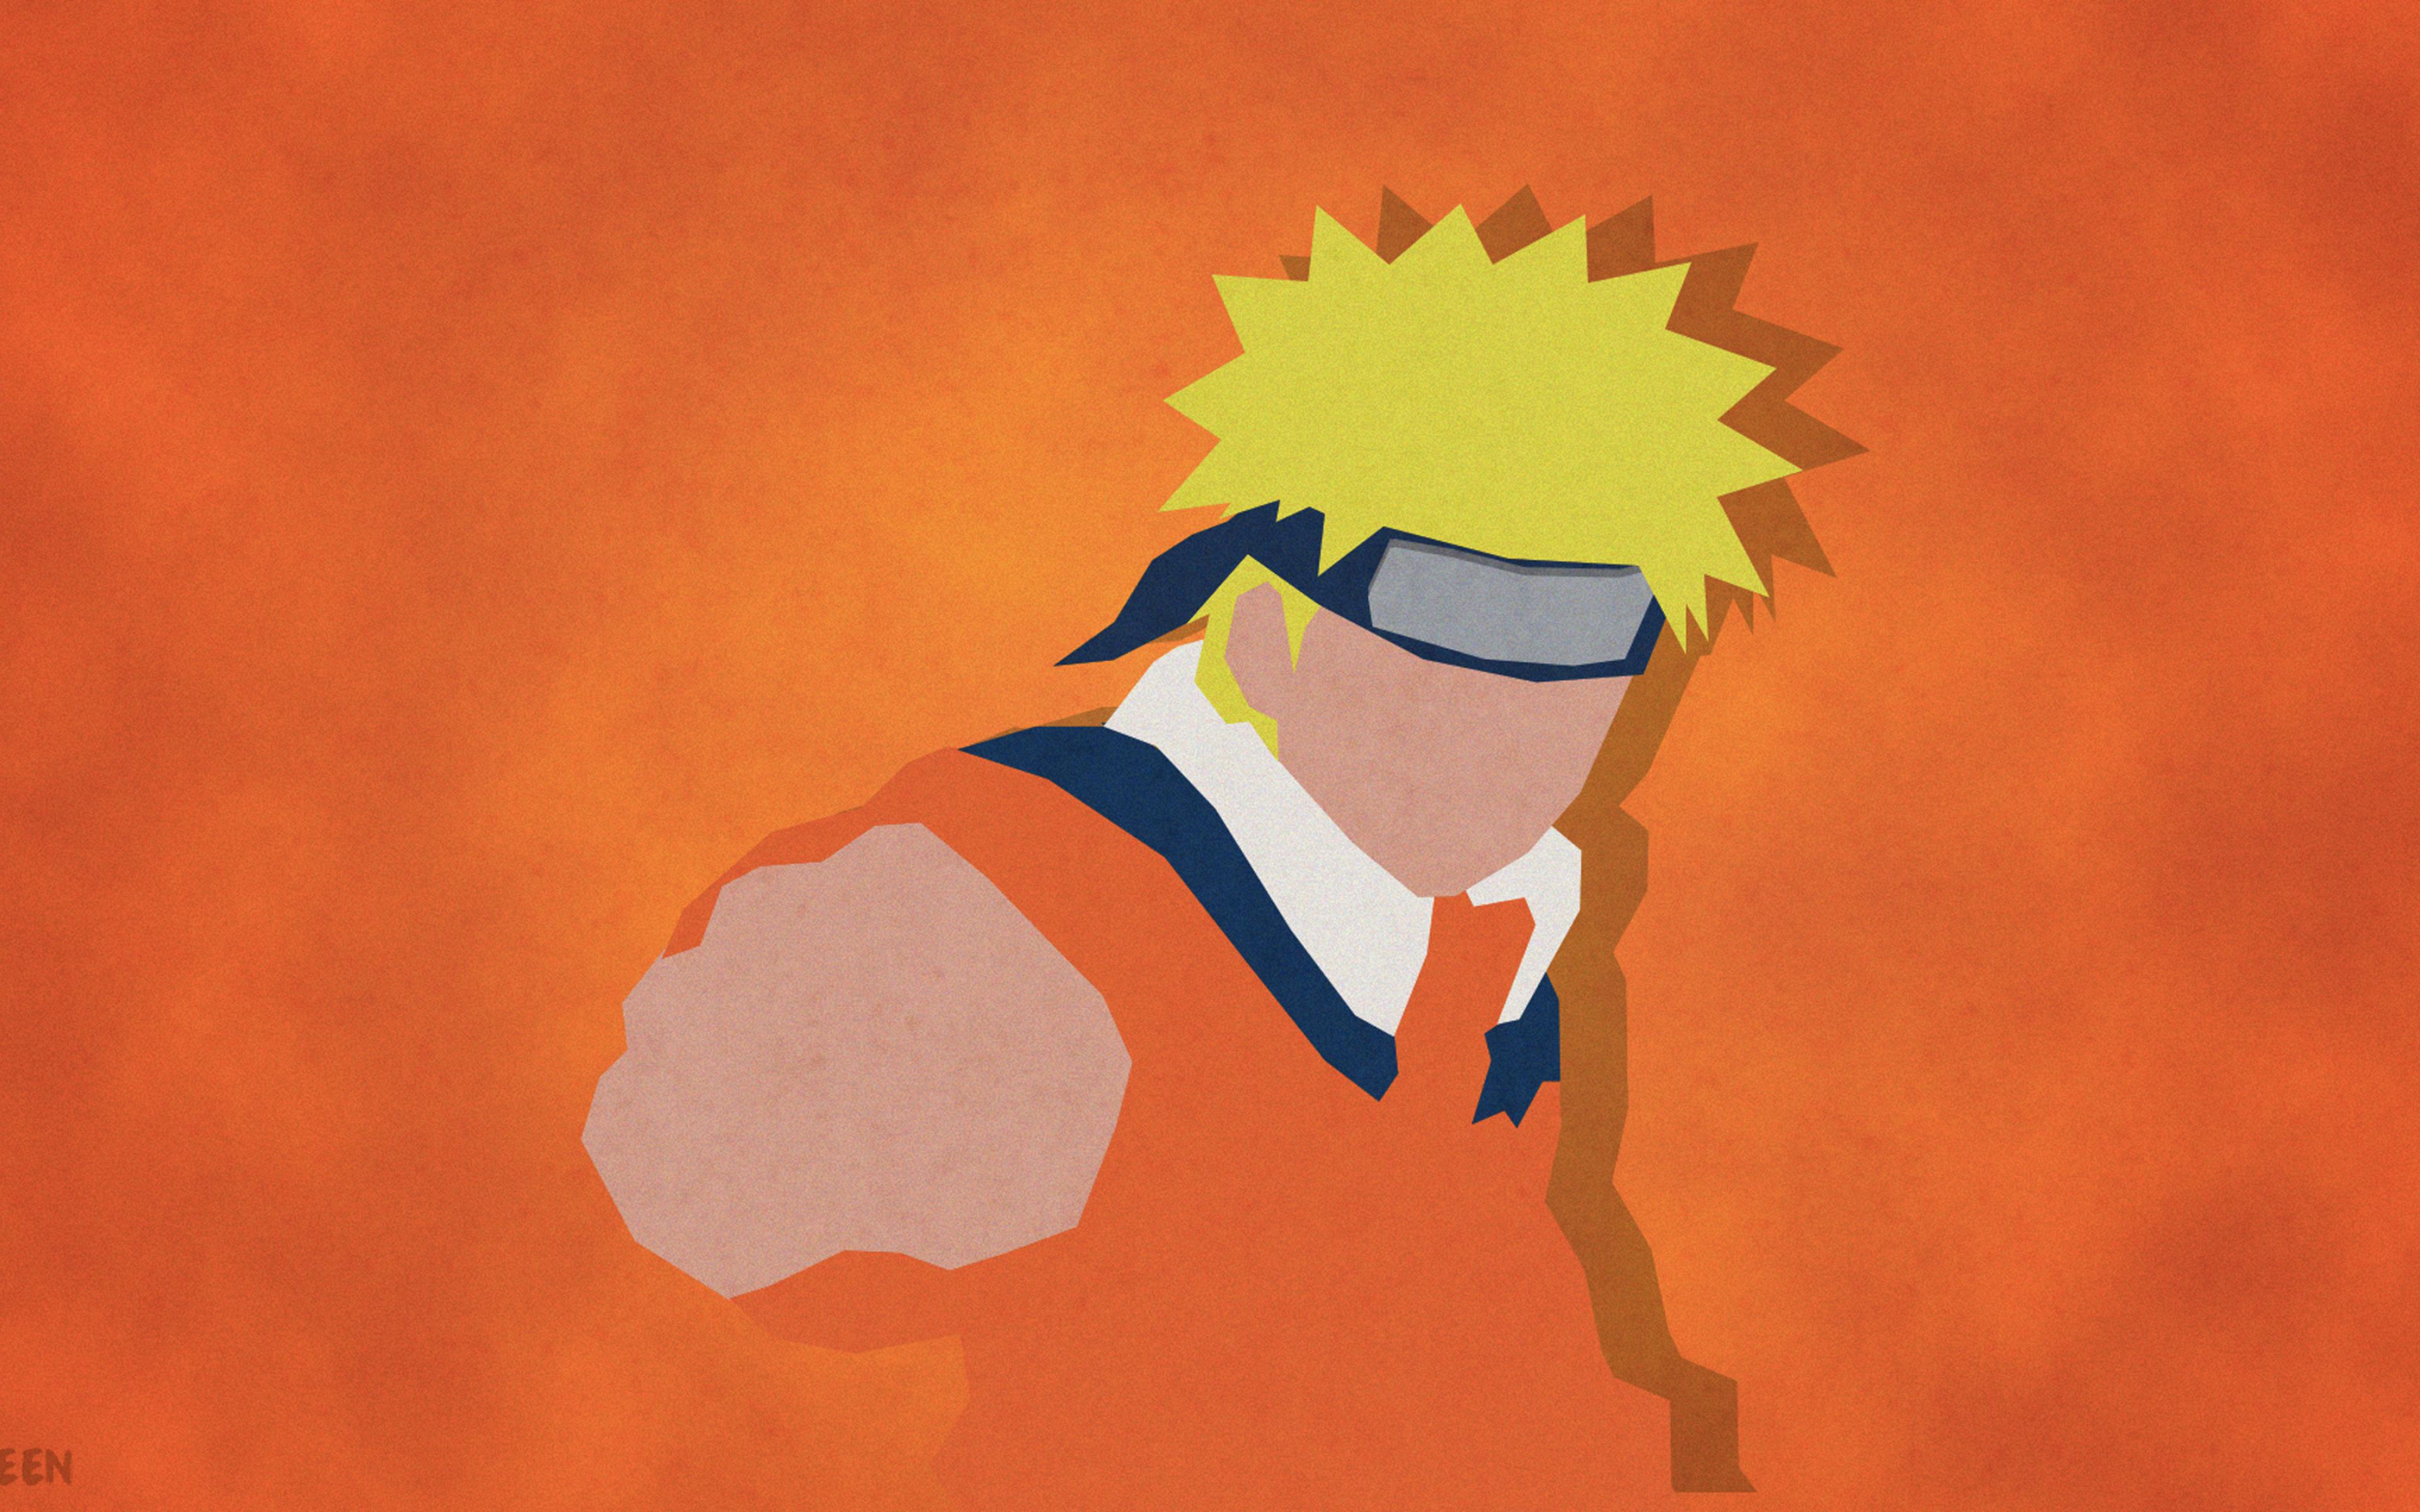 Download Uzumaki Naruto Shippuuden Minimalism 1366x768 ...